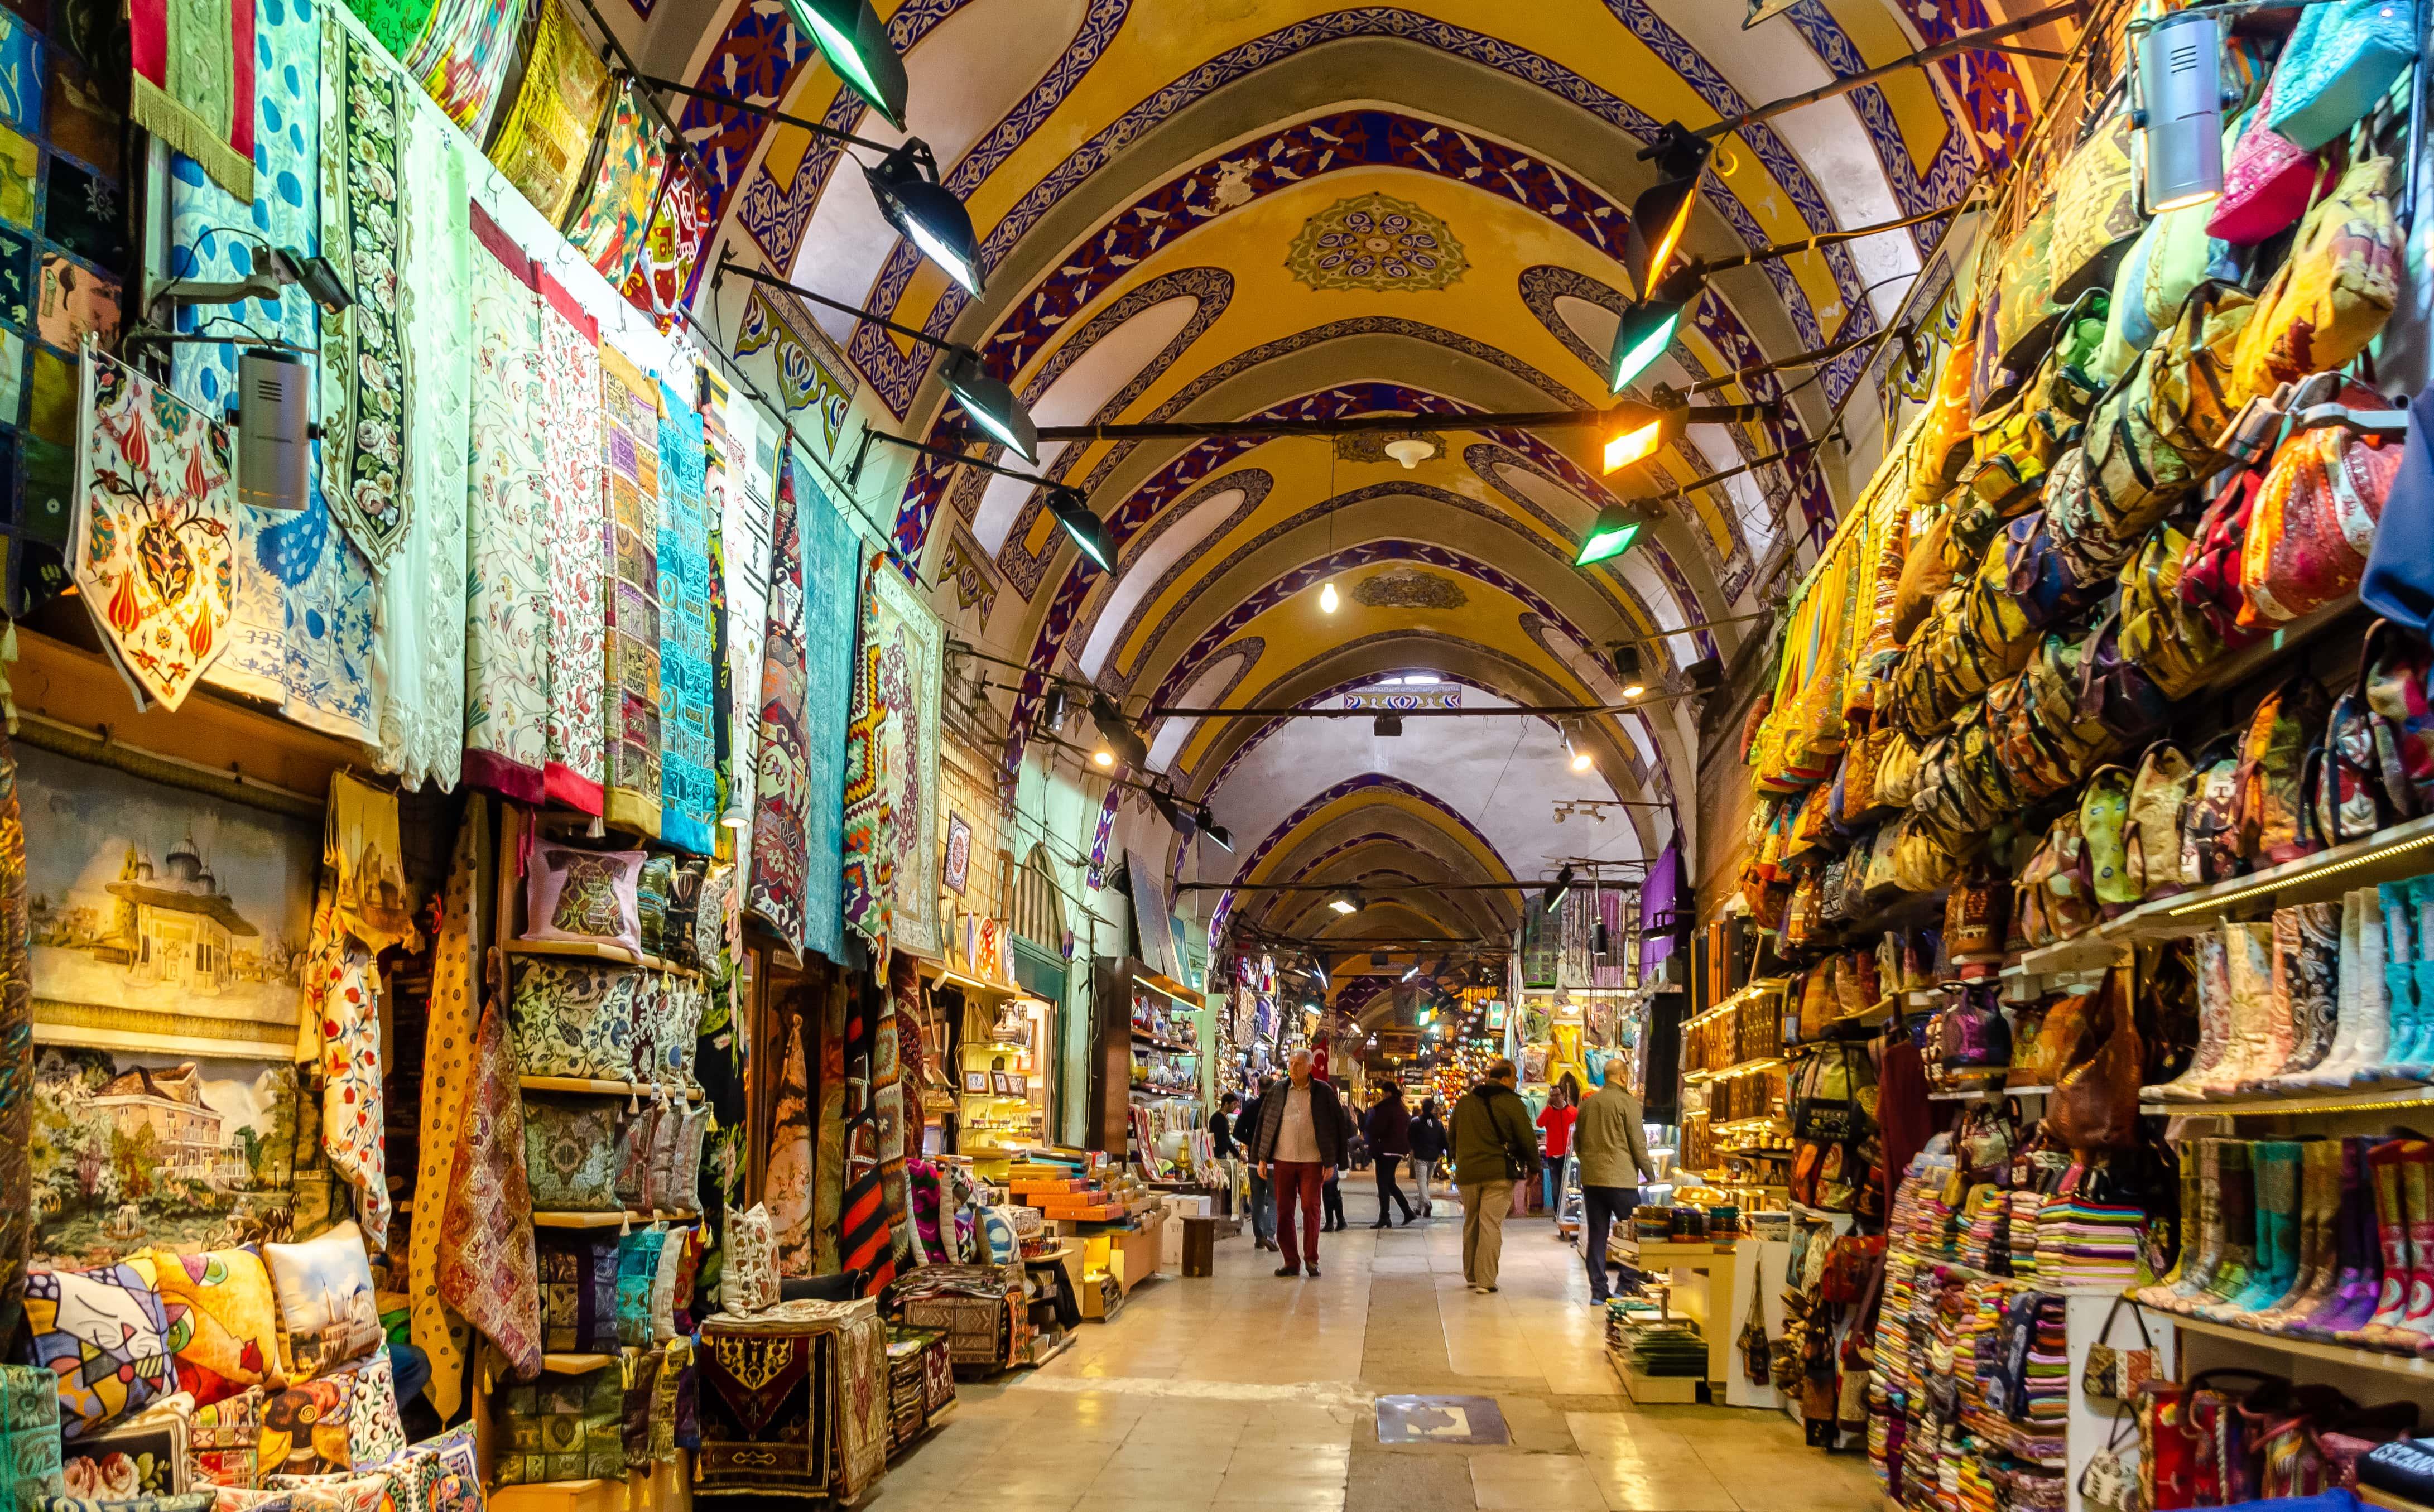 PhotoPOSTcard: In Istanbul's Grand Bazaar